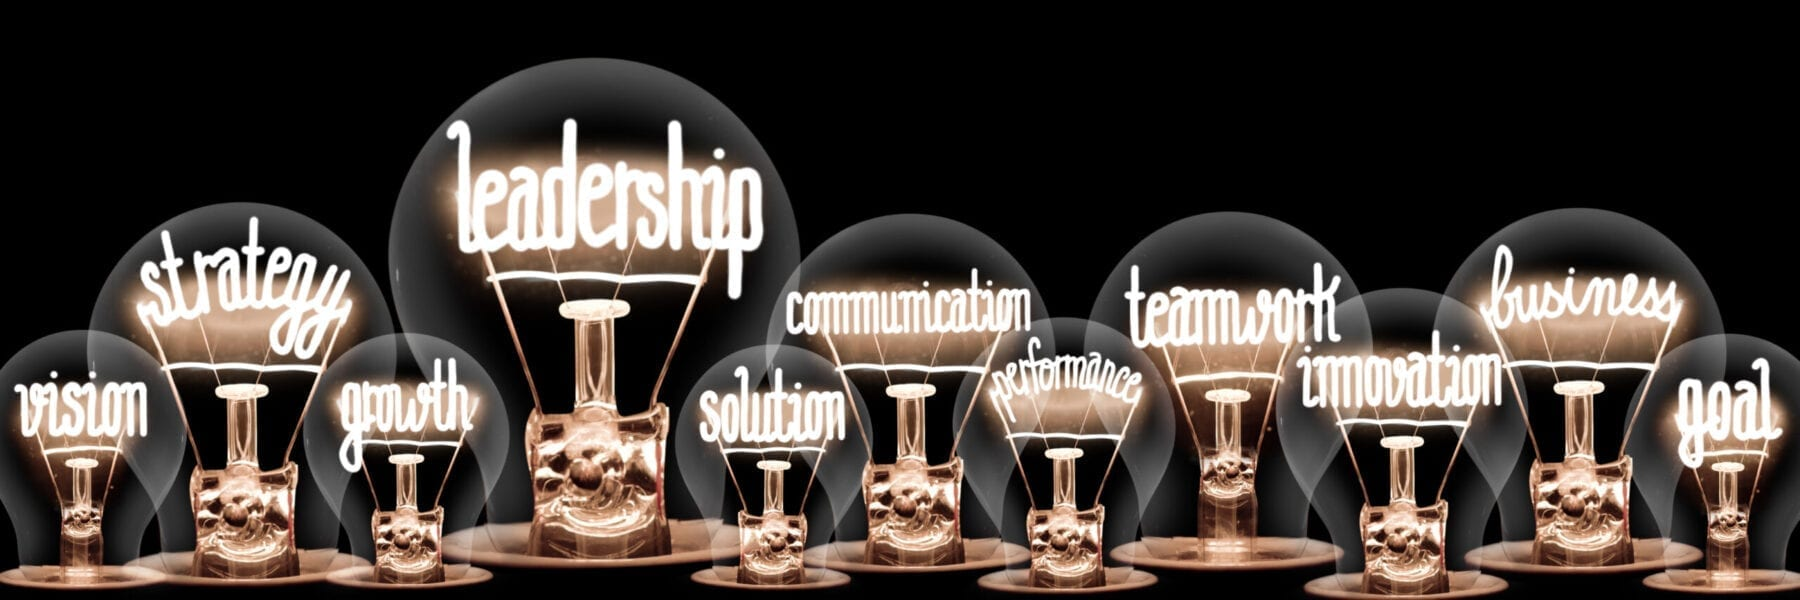 Light Bulbs with Leadership Concept